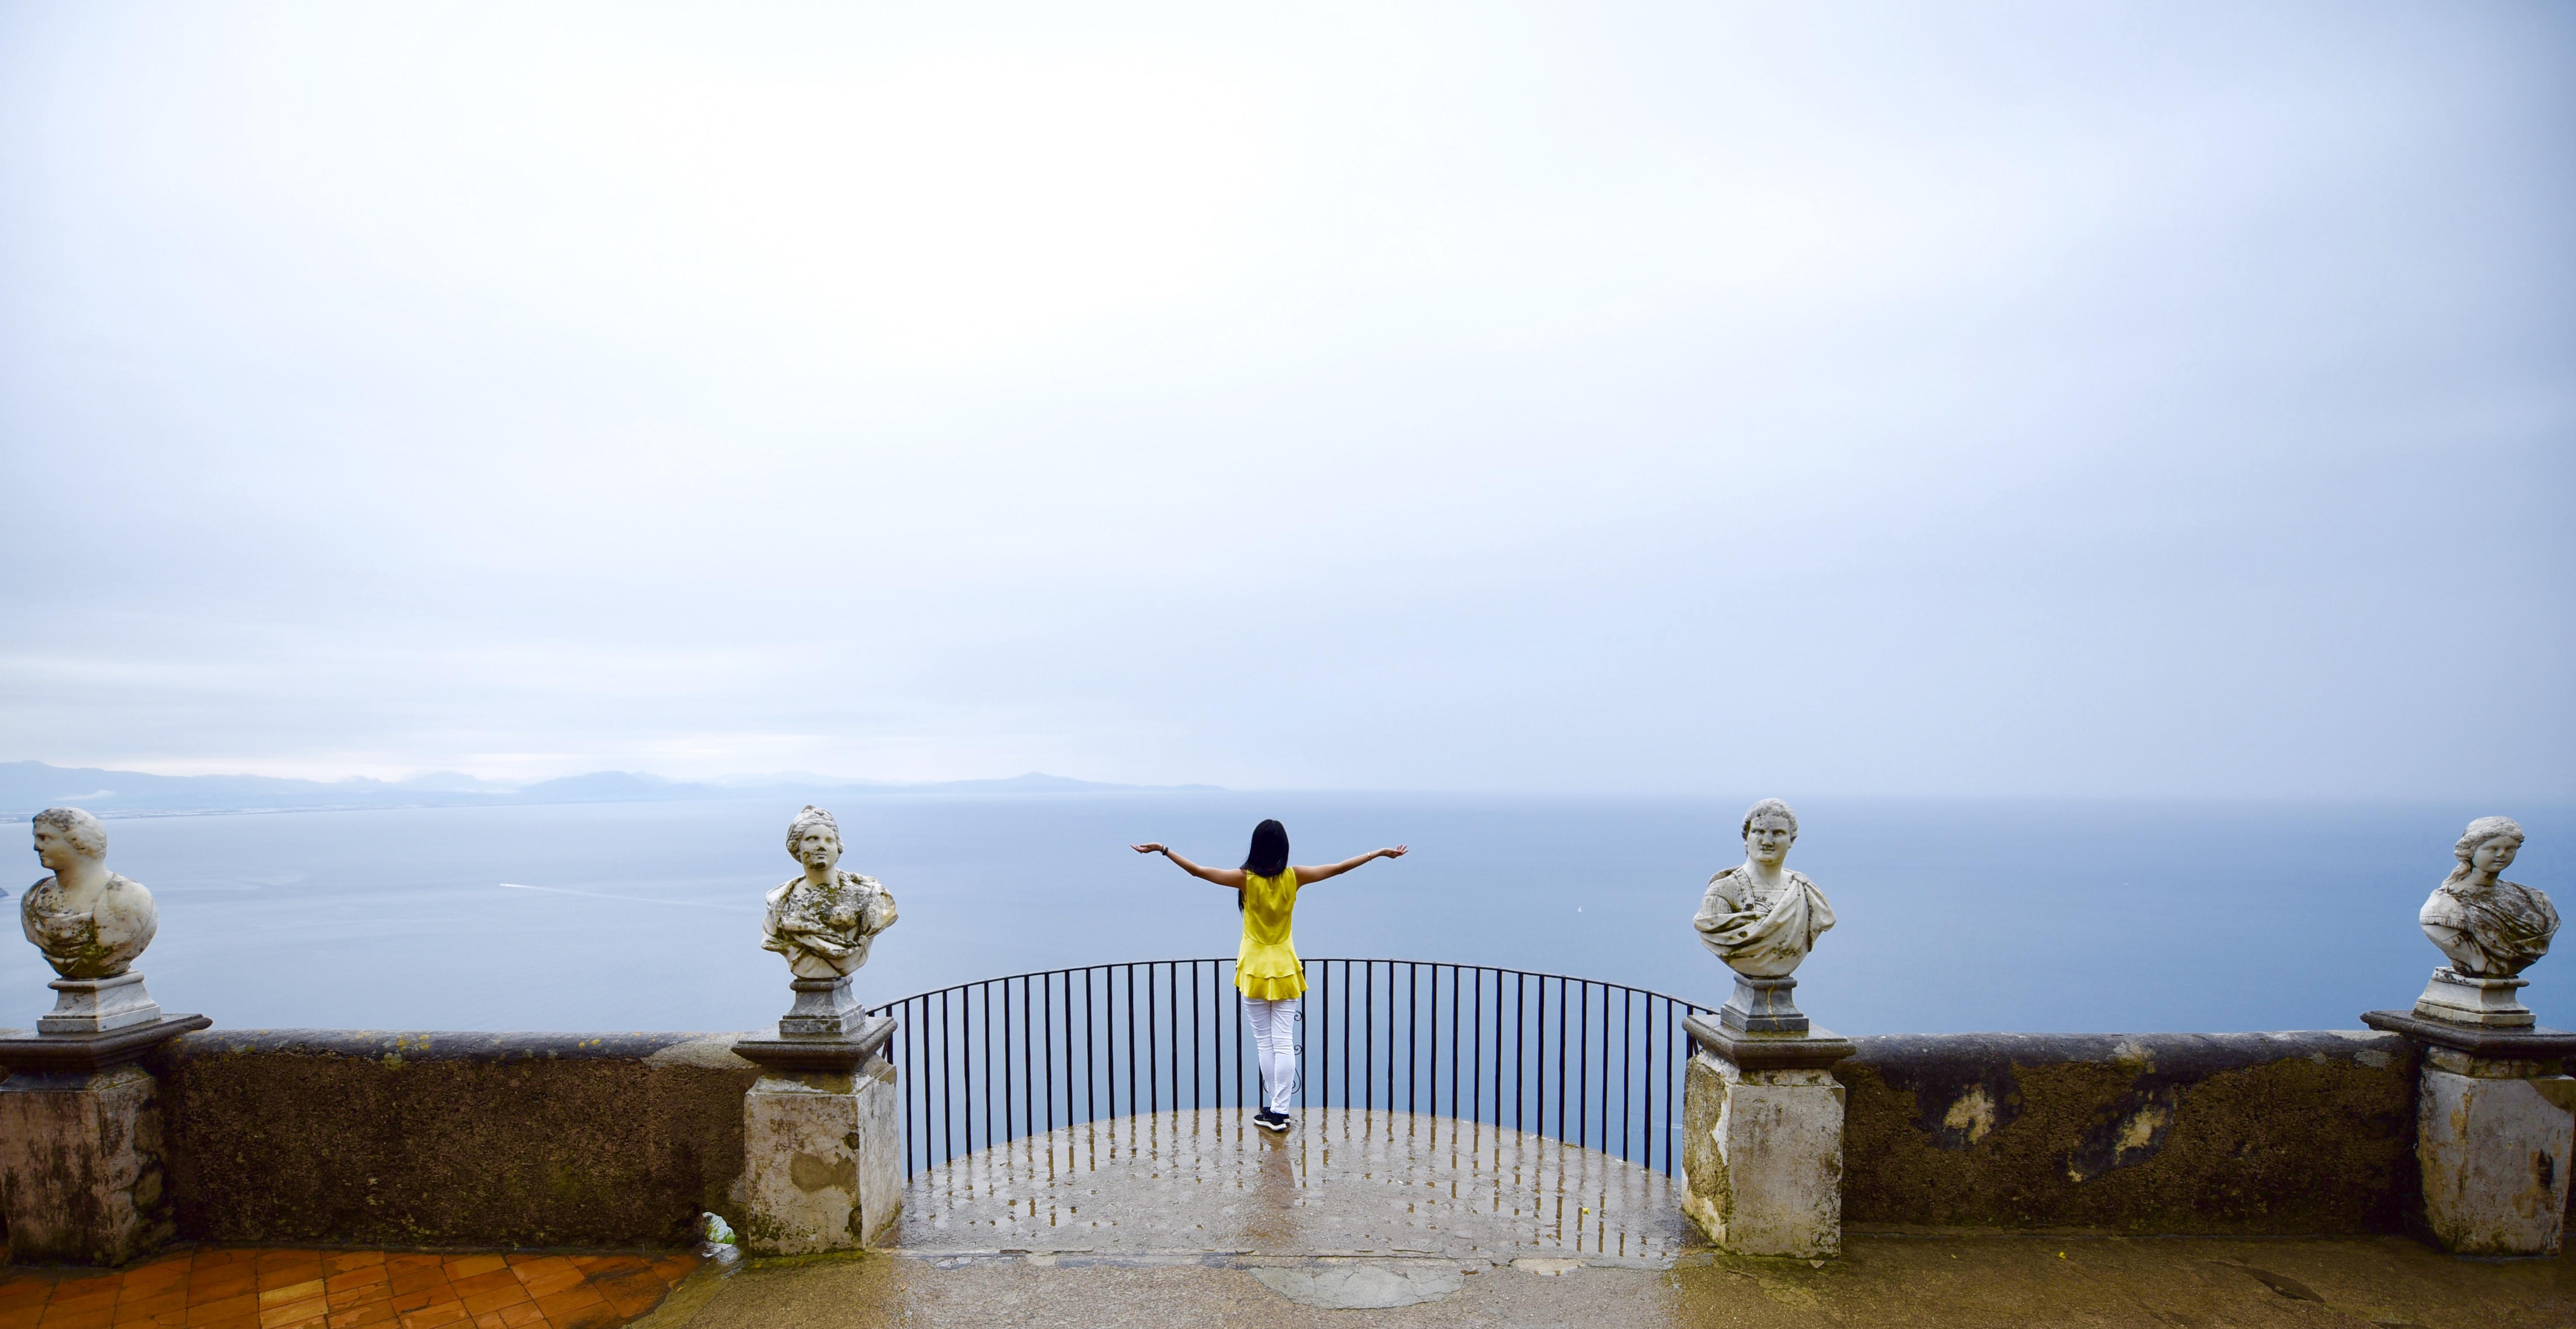 Woman Villa Cimbrone Terrazza dell'Infinito Terrace Infinity Ravello Amalfi Coast DNXB dongnanxibei